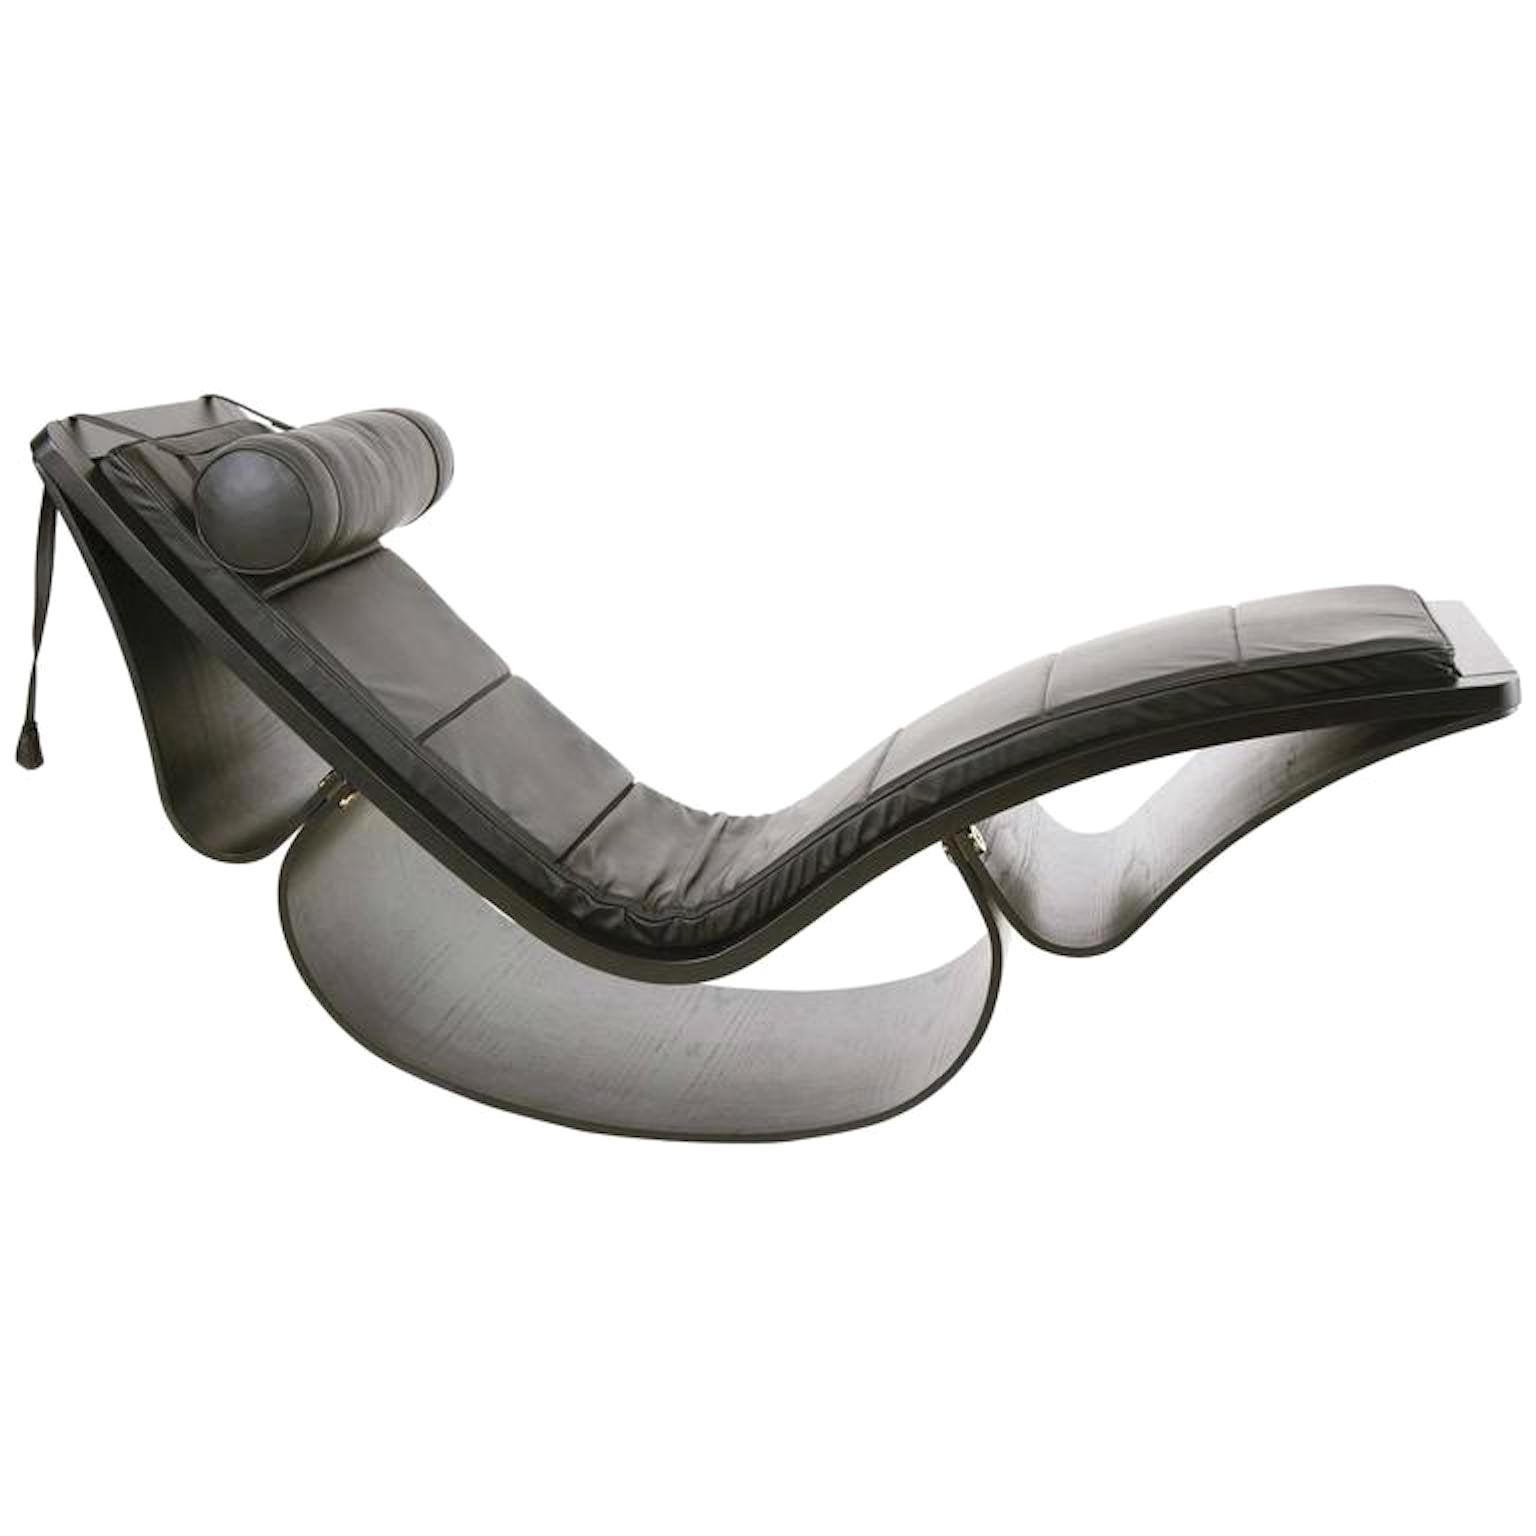 Oscar Niemeyer Chaise Lounge Model Rio Prod. Fasem, Italy